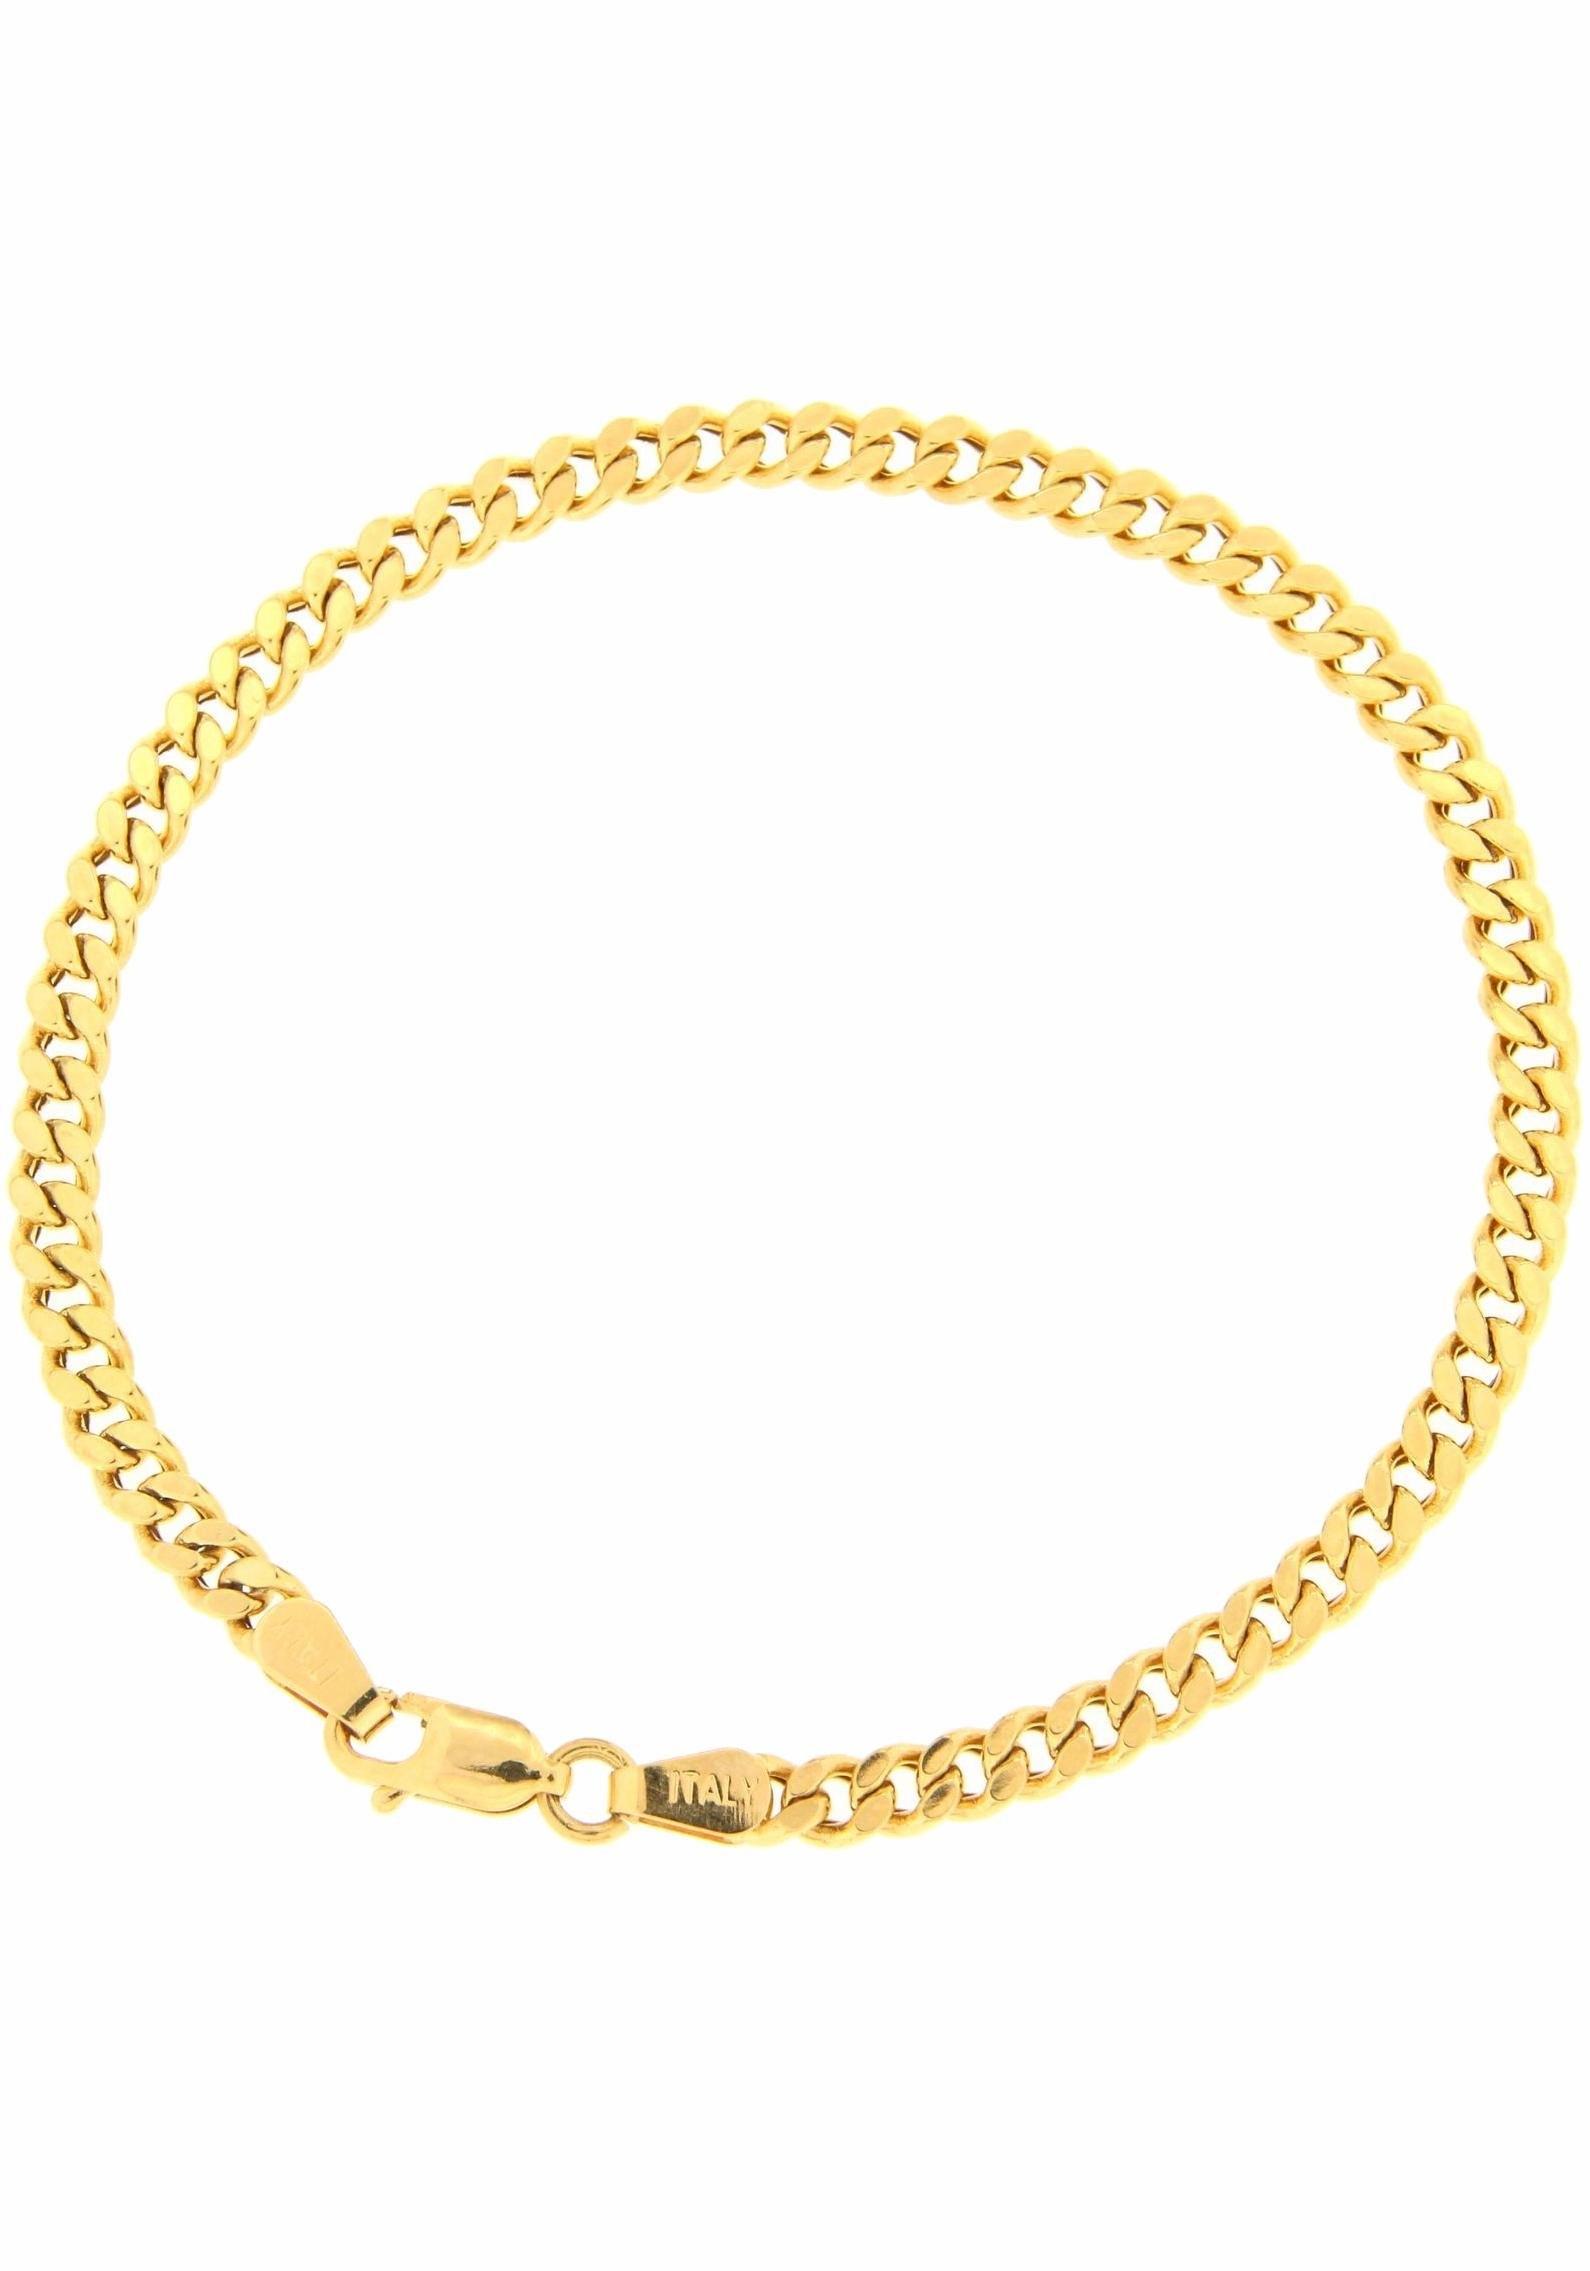 Firetti pantserarmband Gediamanteerd, gouden armband, 3,6 mm breed voordelig en veilig online kopen